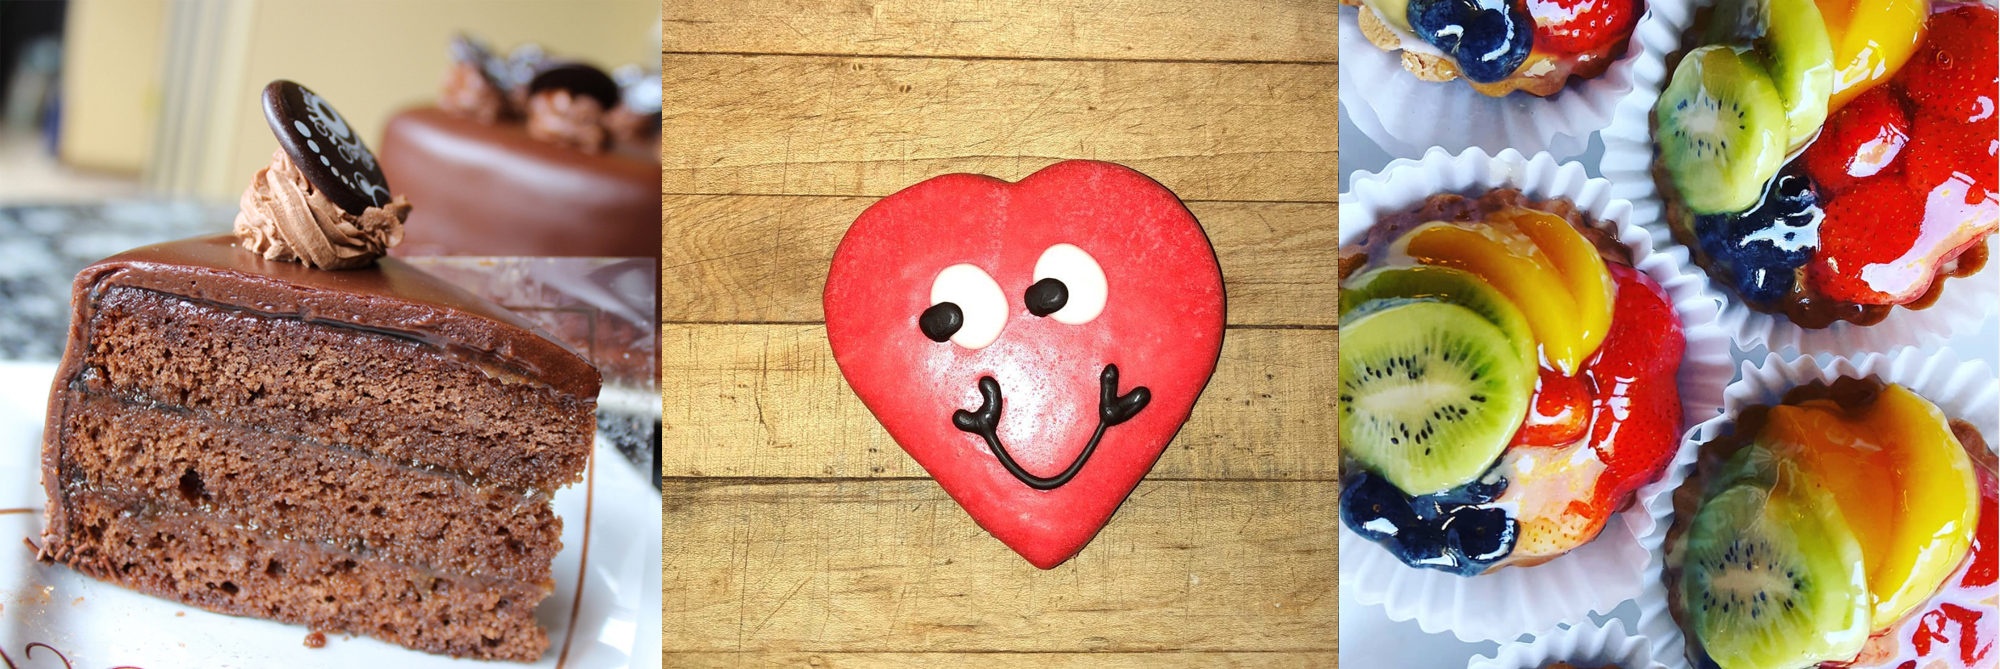 Chocolate cake, heart shaped sugar cookie, fruit tarts